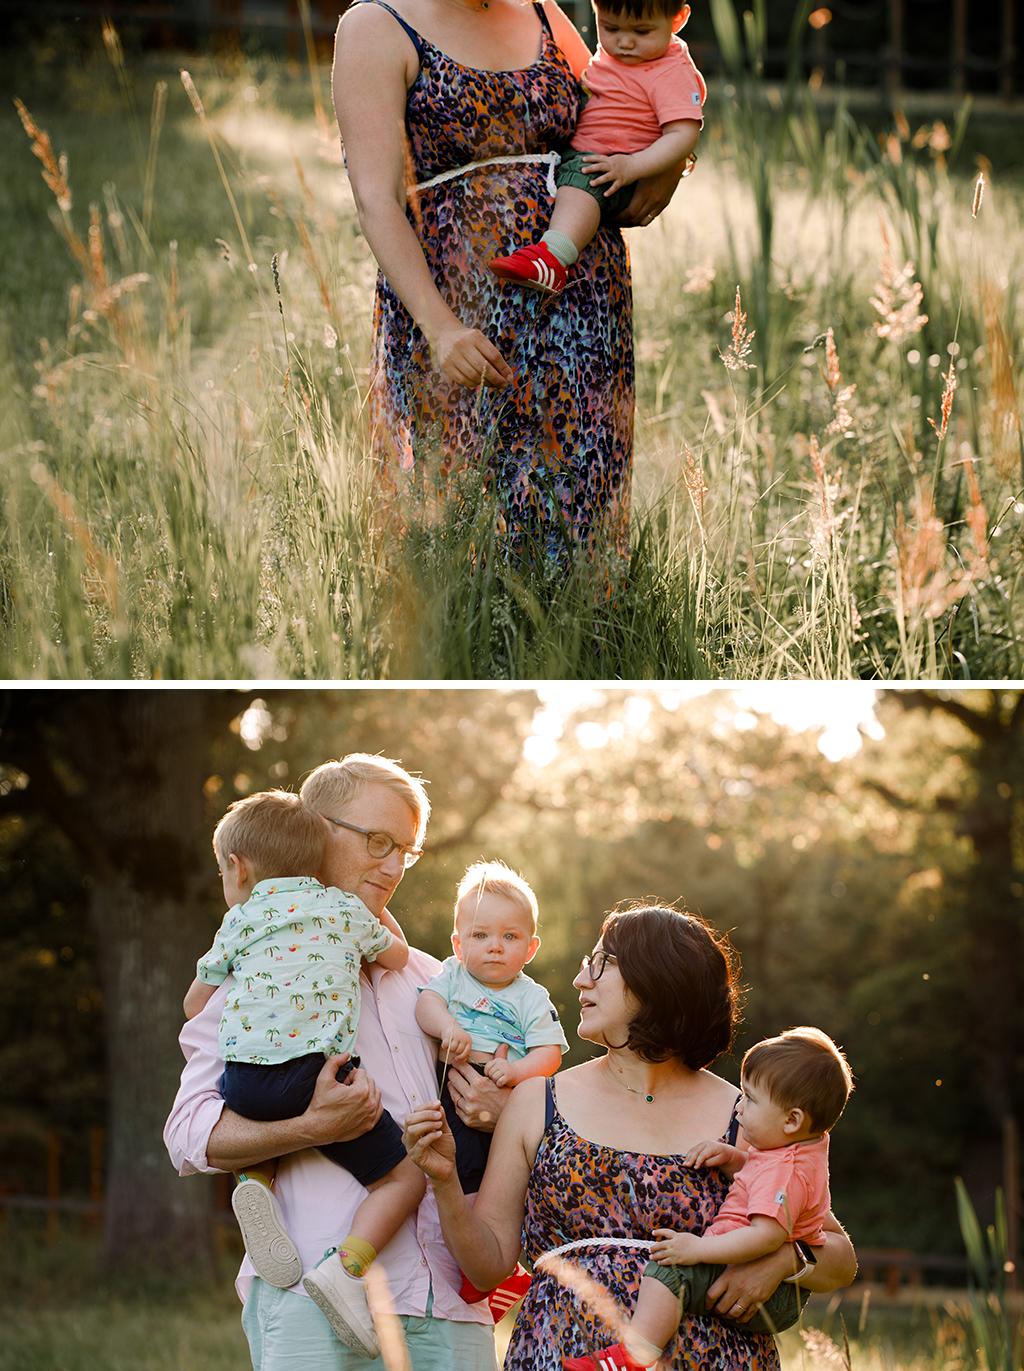 Sommar-familjefotografering_Stockholm_Anna_Sandstrom_15.jpg